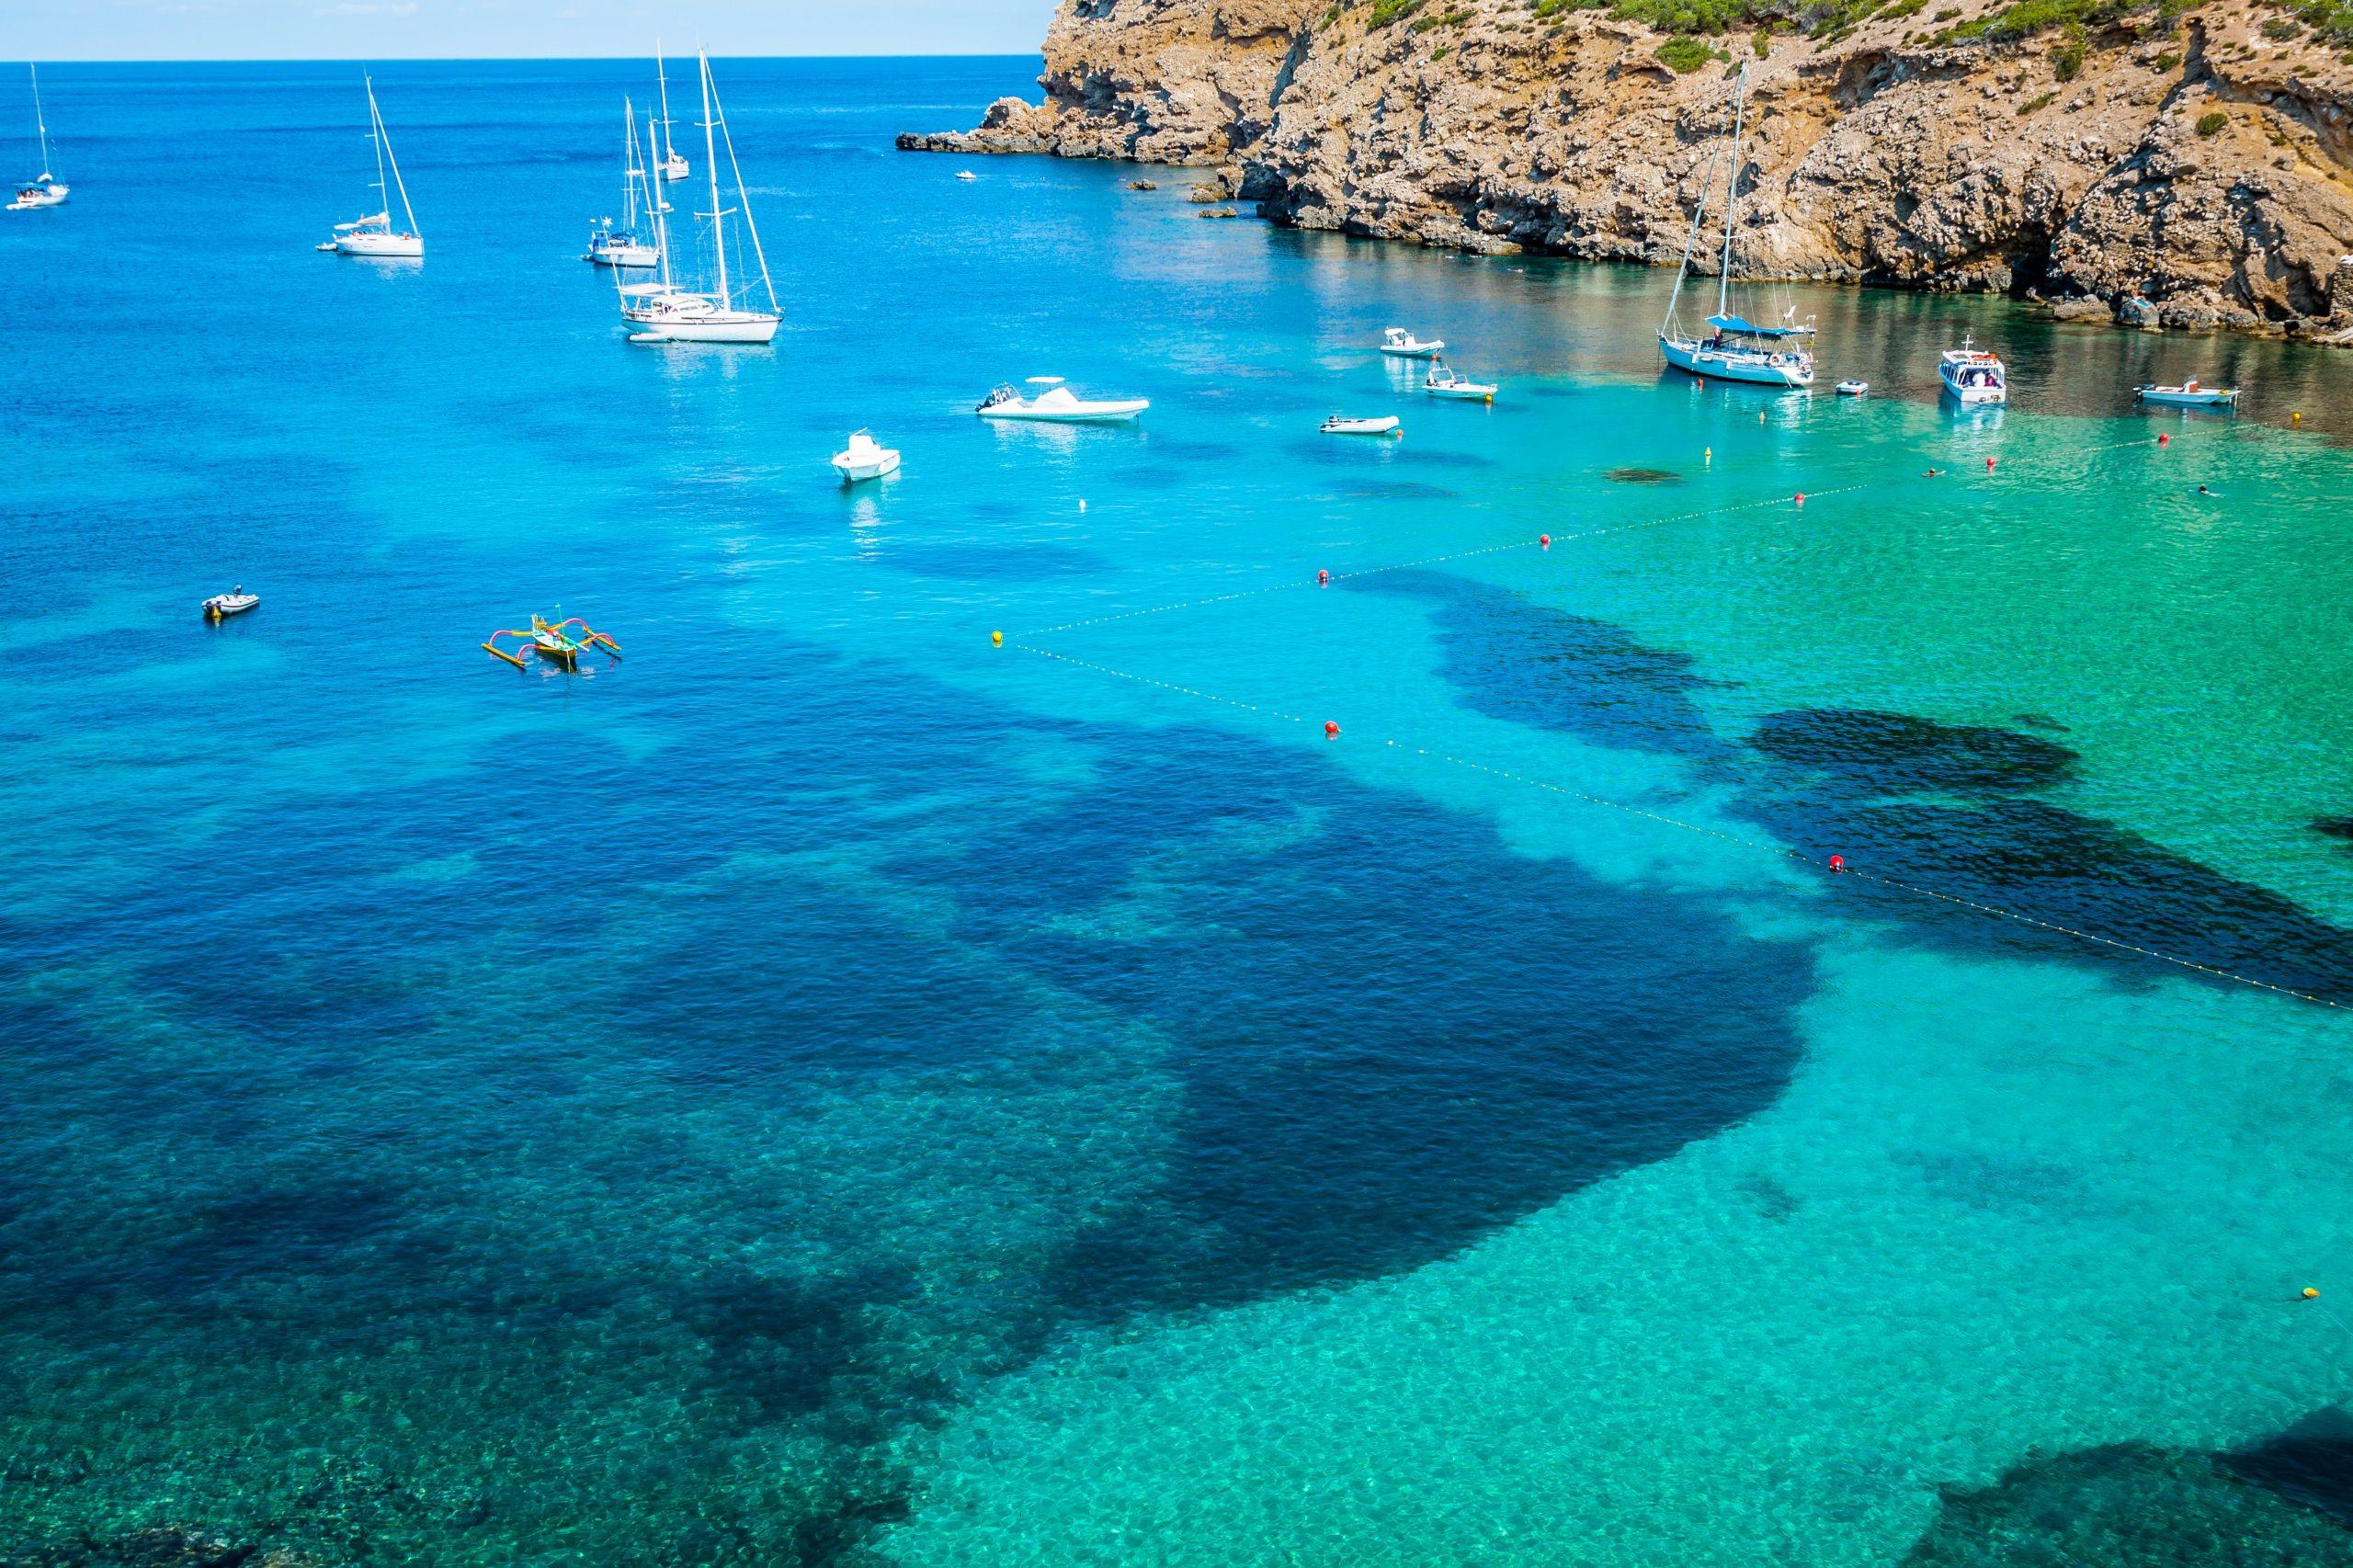 Fonds D Ecran Espagne Cote A Voile Mer Ibiza Nature Image 442732 Telecharger Ibiza Espagne Fond Ecran